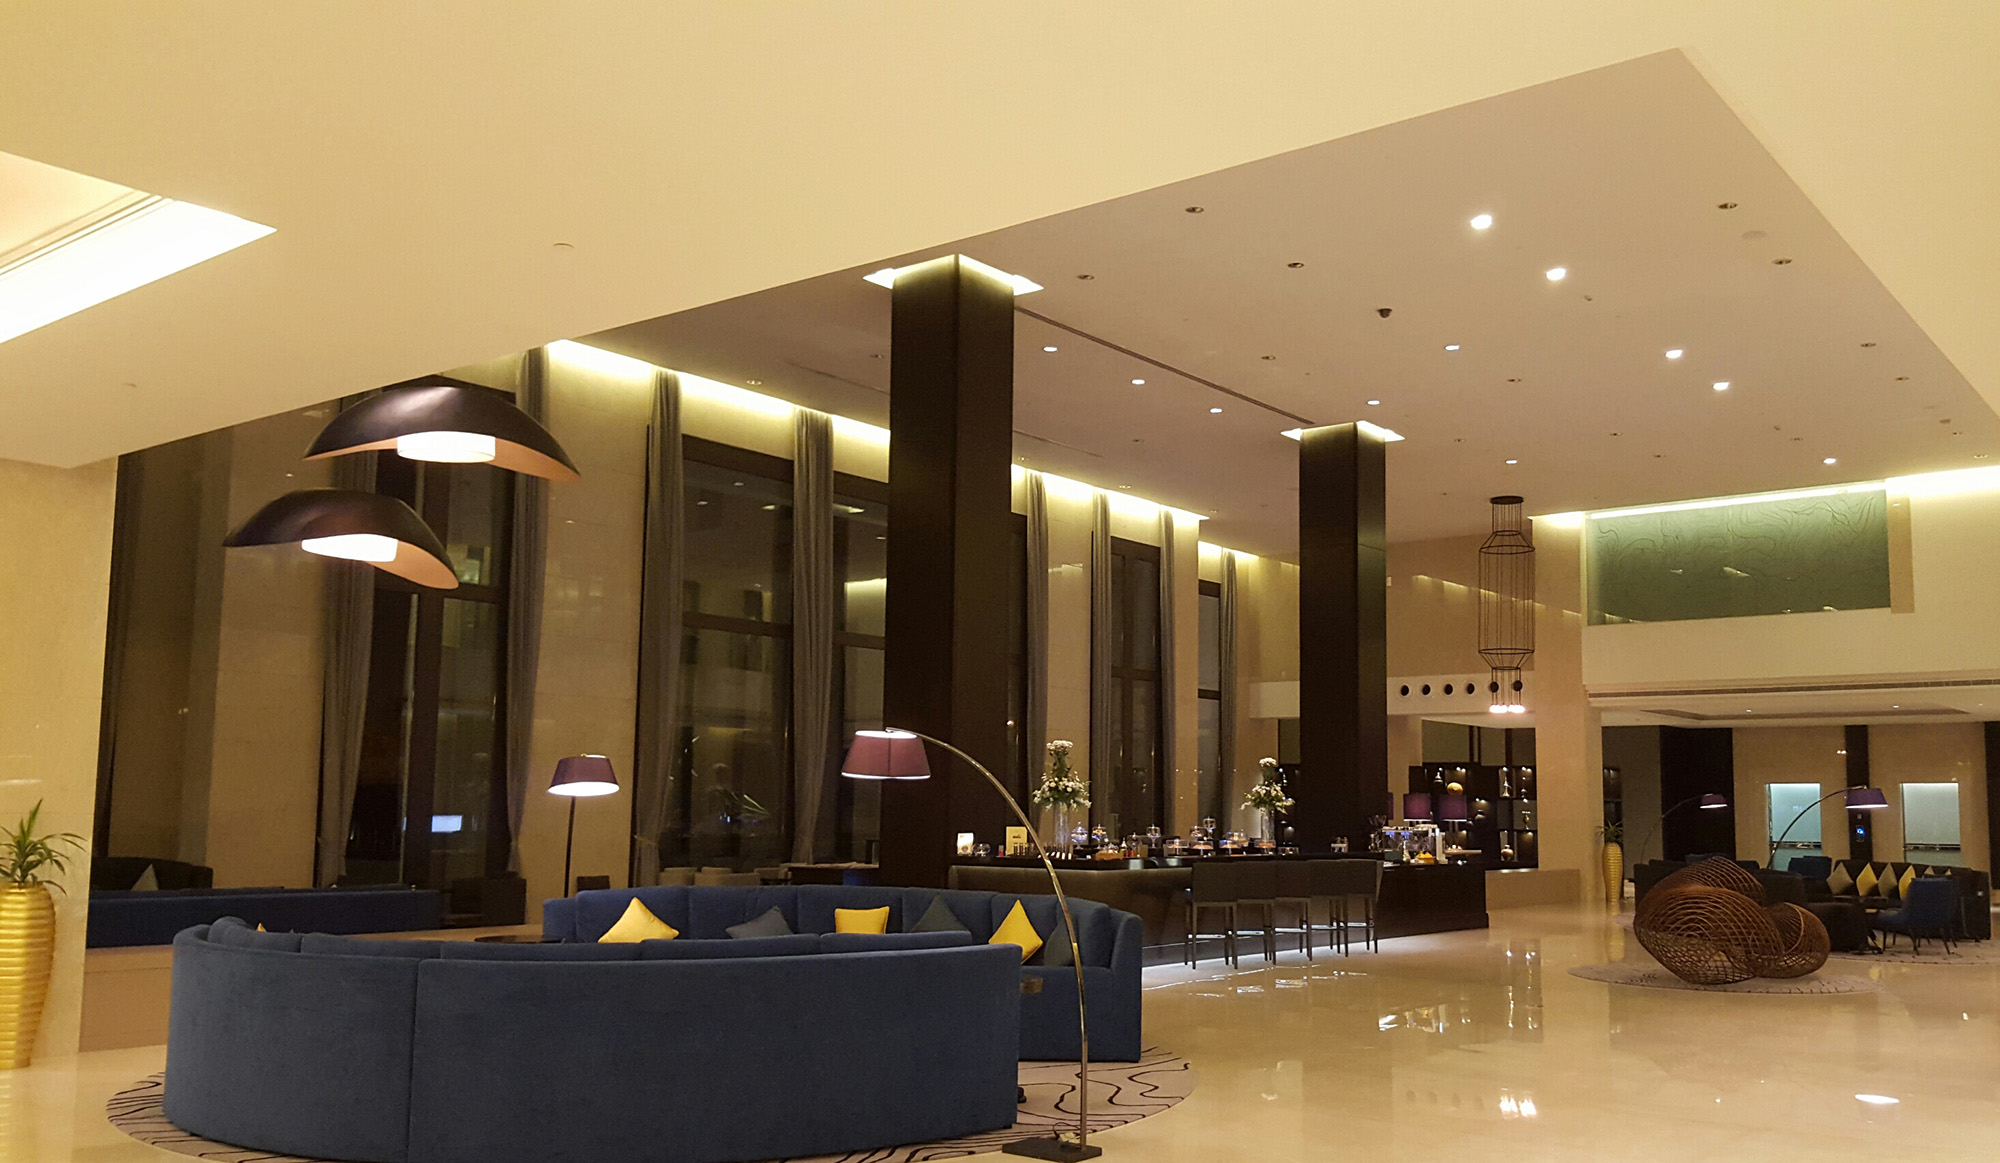 Hormuz Grand Reception foyer.jpg